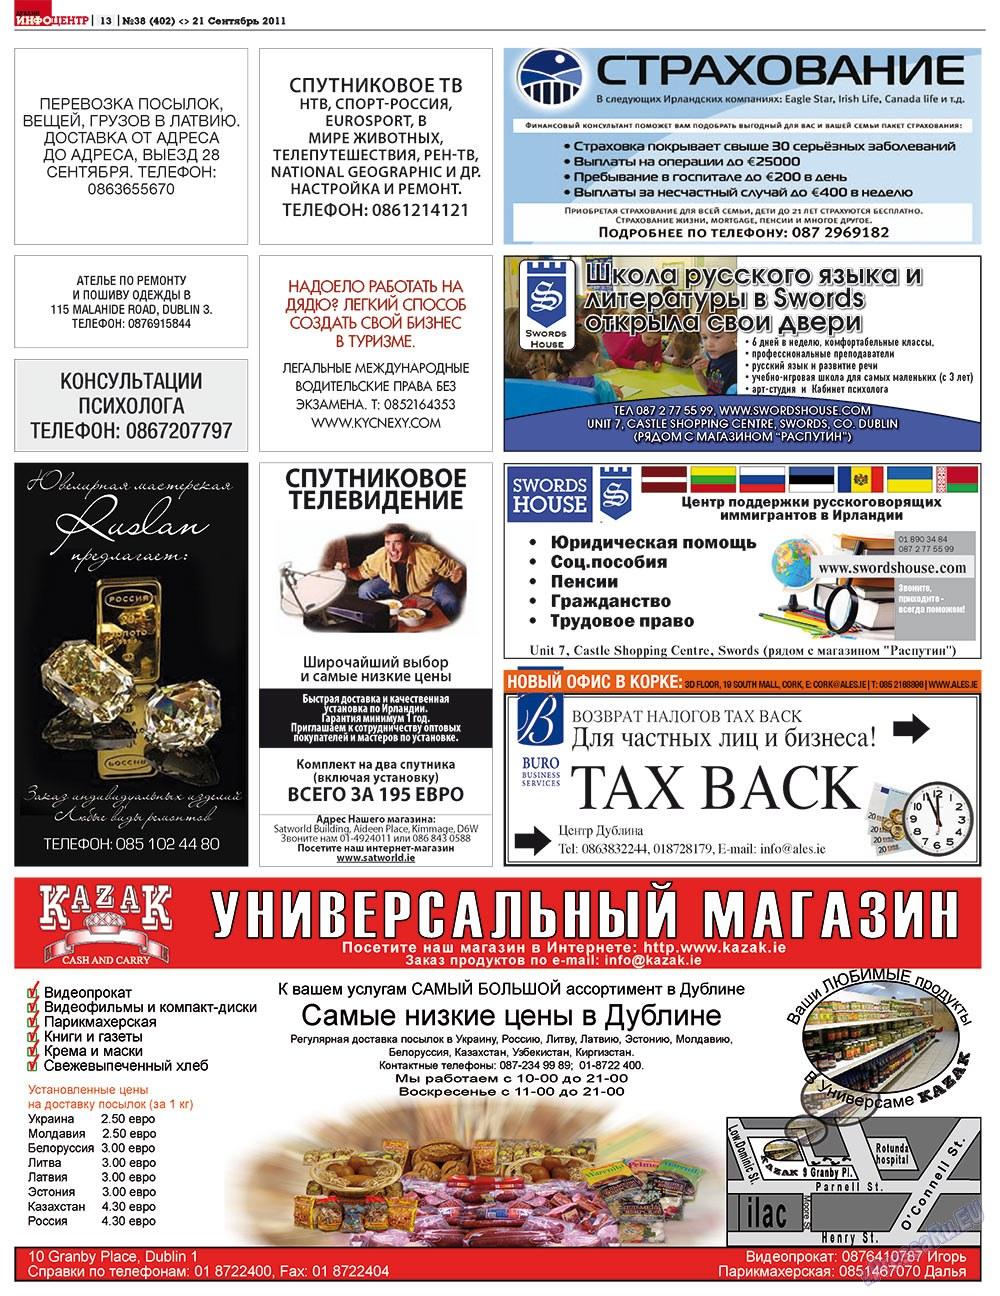 Дублин инфоцентр (газета). 2011 год, номер 38, стр. 13